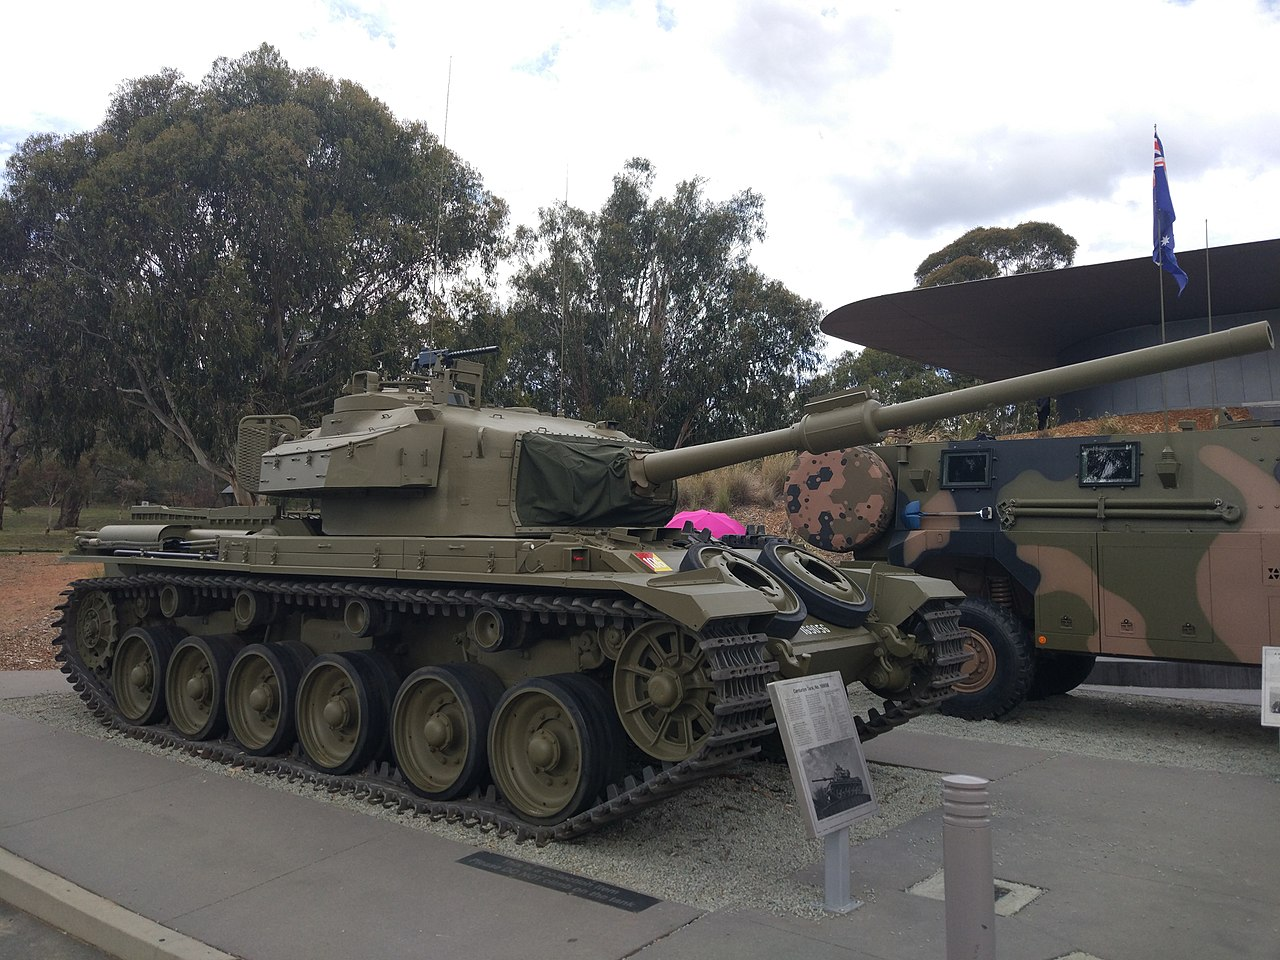 1280px-Centurion_Tank_AWM.jpg